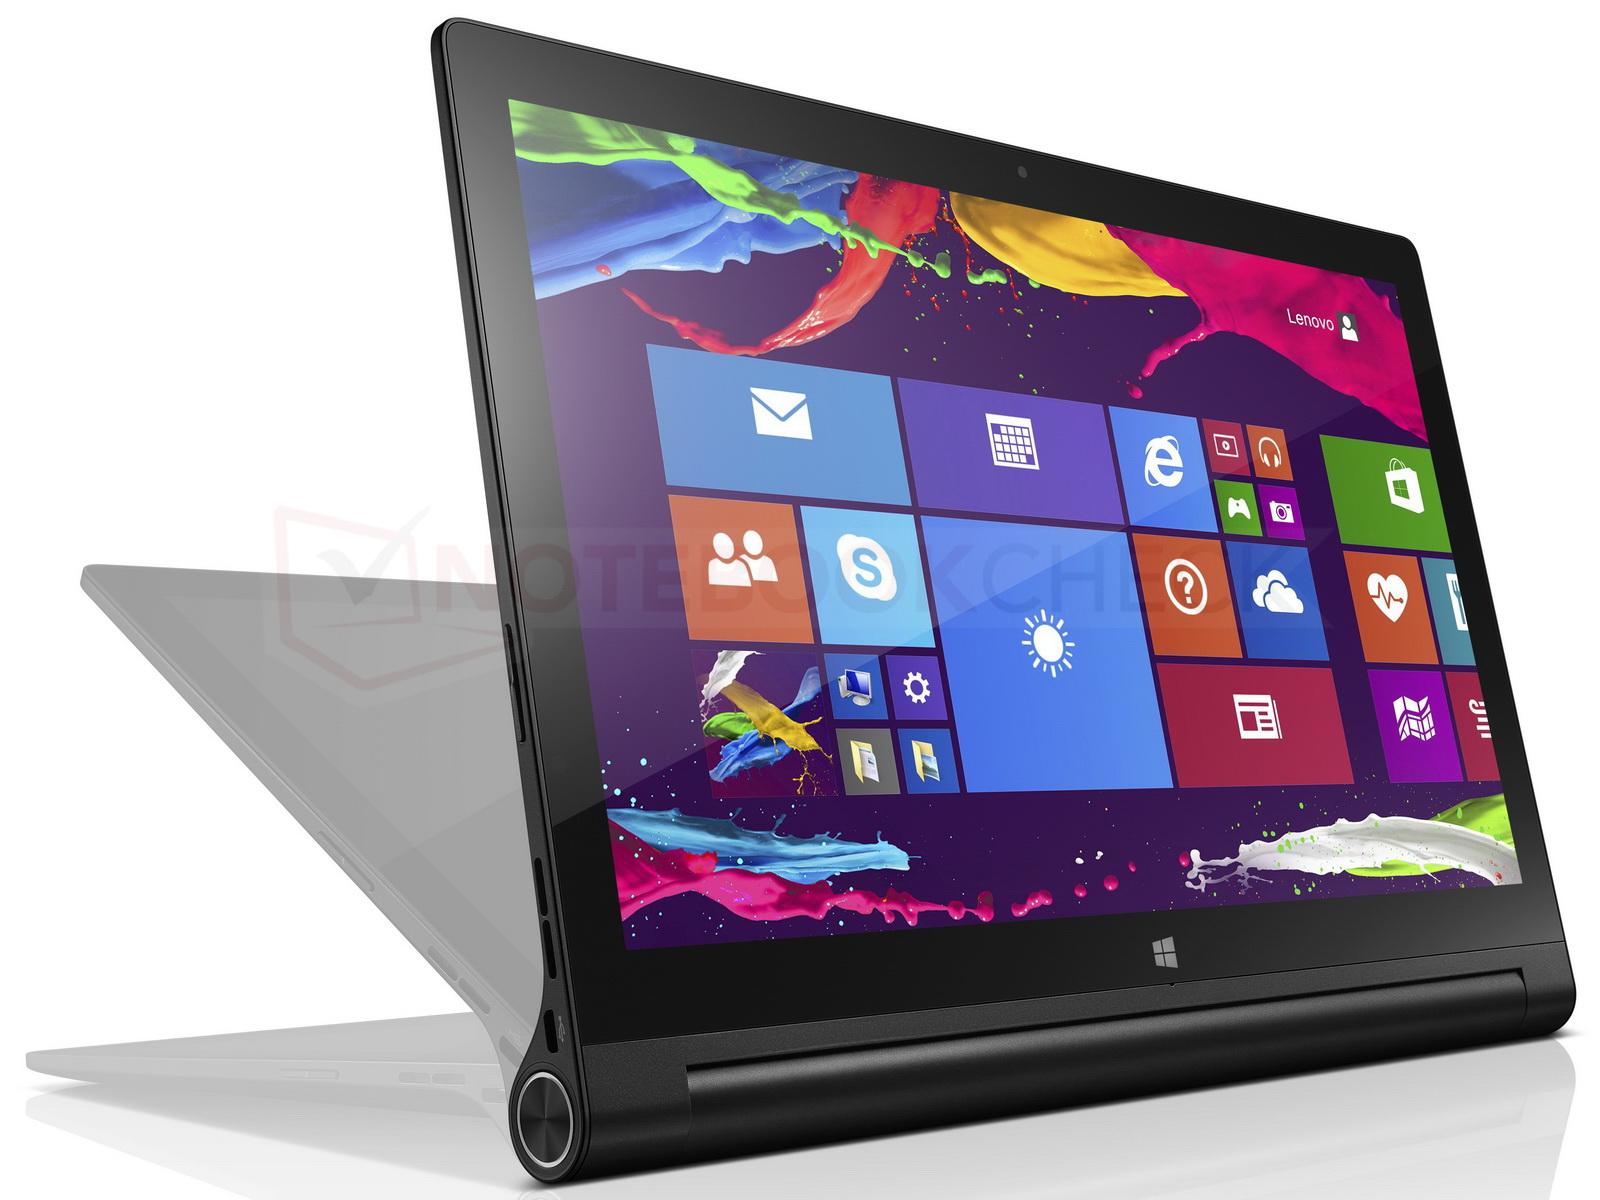 lenovo 13 zoll yoga tablet 2 mit windows 8 1. Black Bedroom Furniture Sets. Home Design Ideas